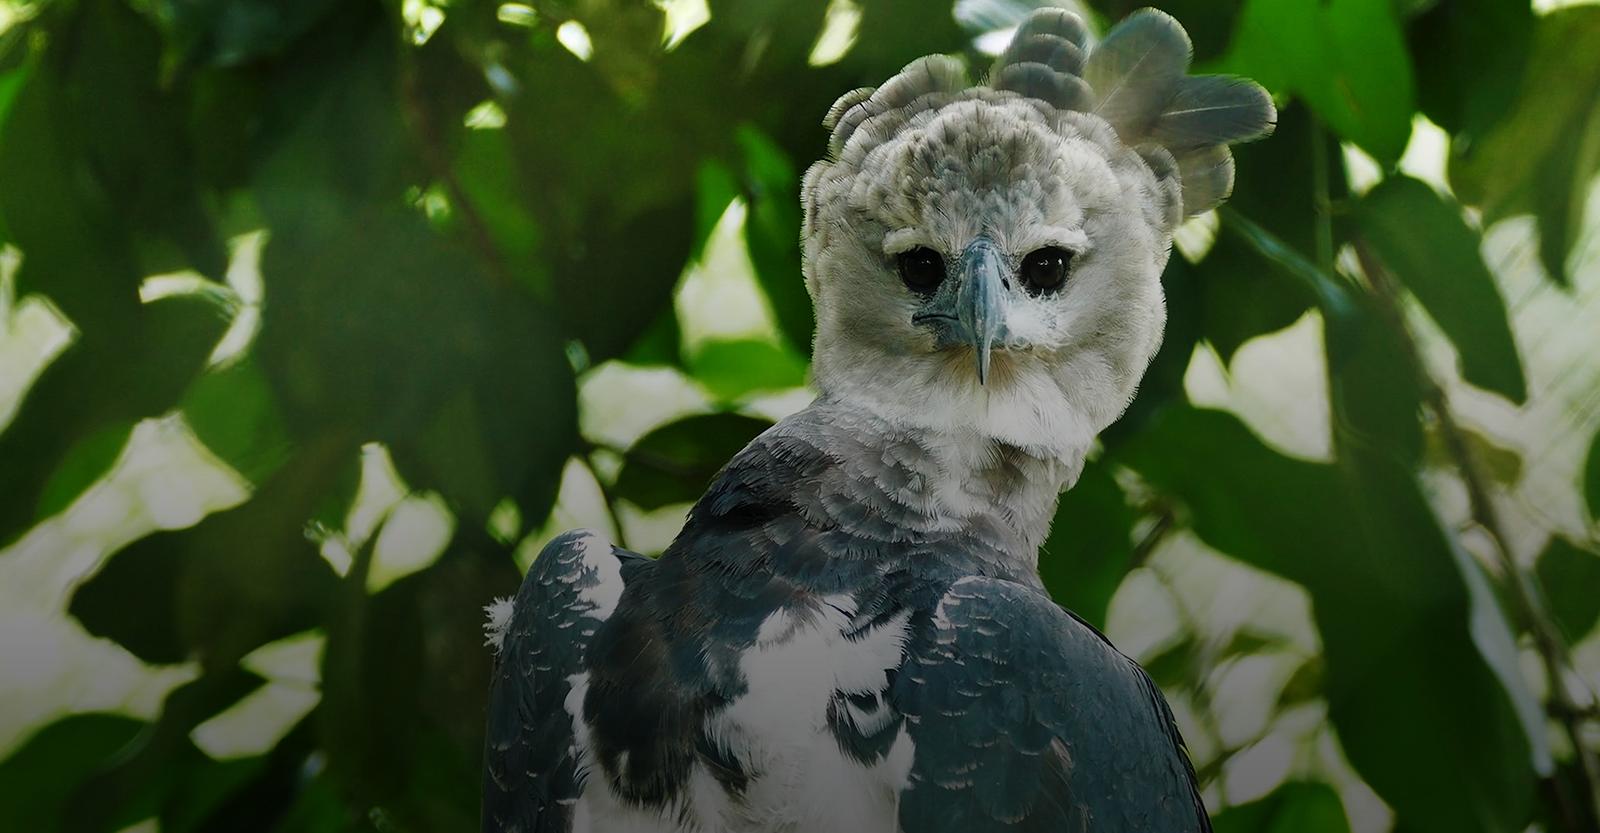 Guyana A Birding Adventure with James Currie